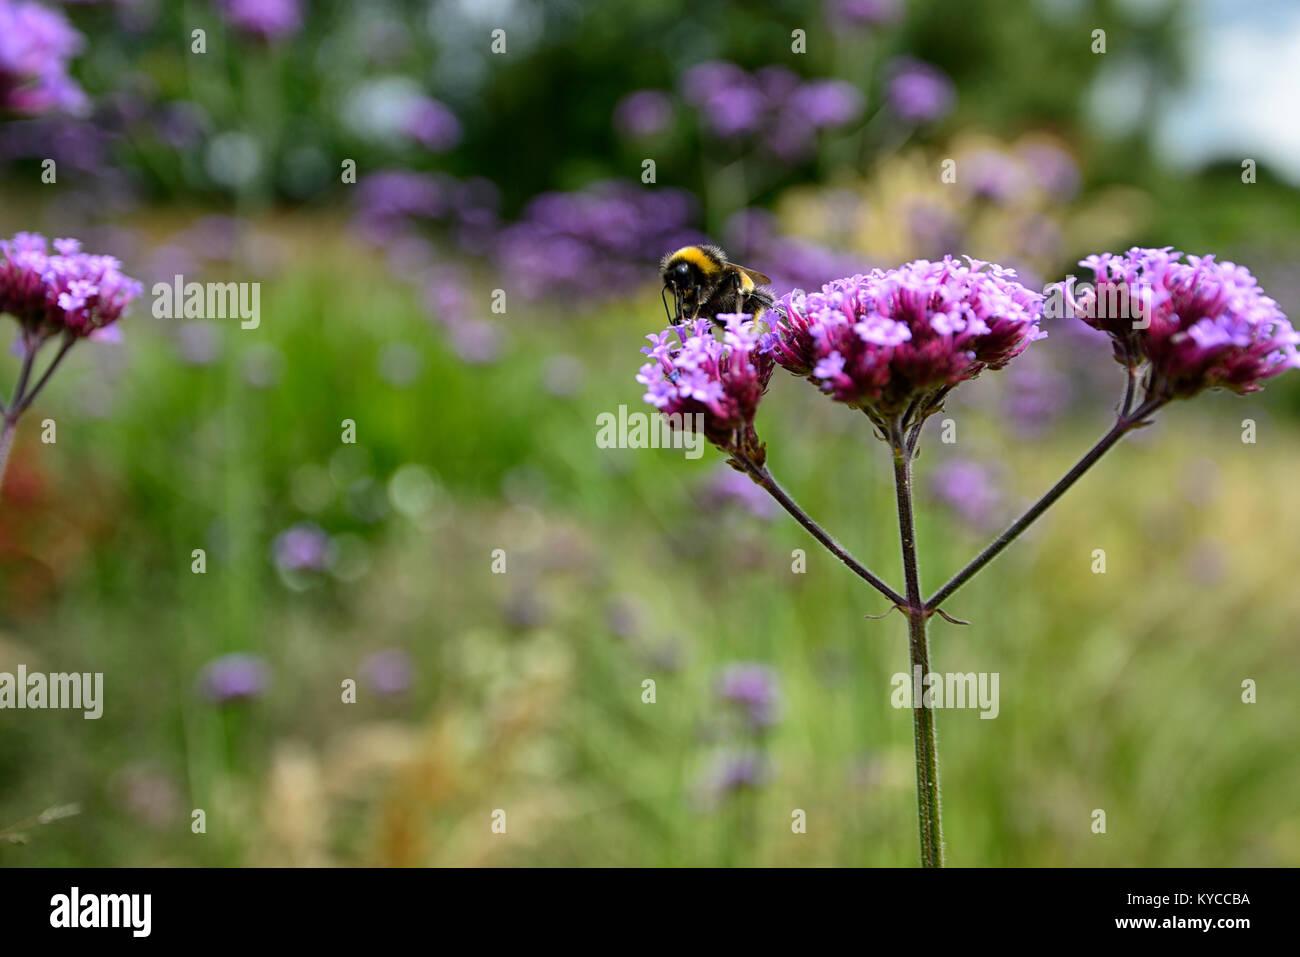 bee,feed,feeding,bee-friendly,verbena bonariensis,tall,perennial,purple,flower,flowers, wildlife,insect,friendly,planting,RM - Stock Image